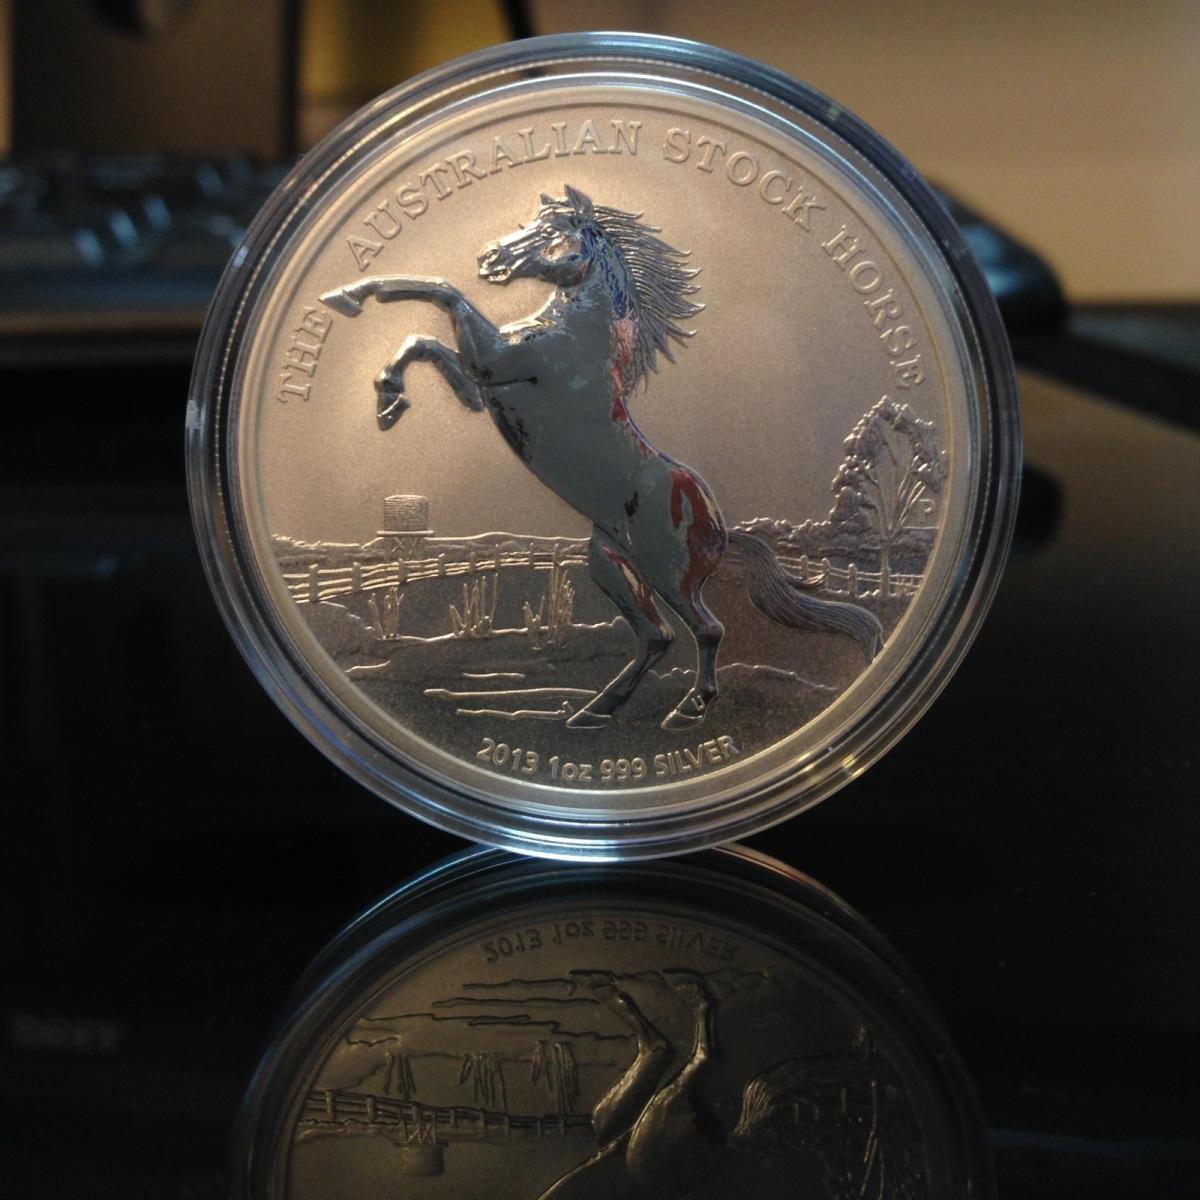 The Australian Stock Horse 2014 1oz Silver Coin To Be